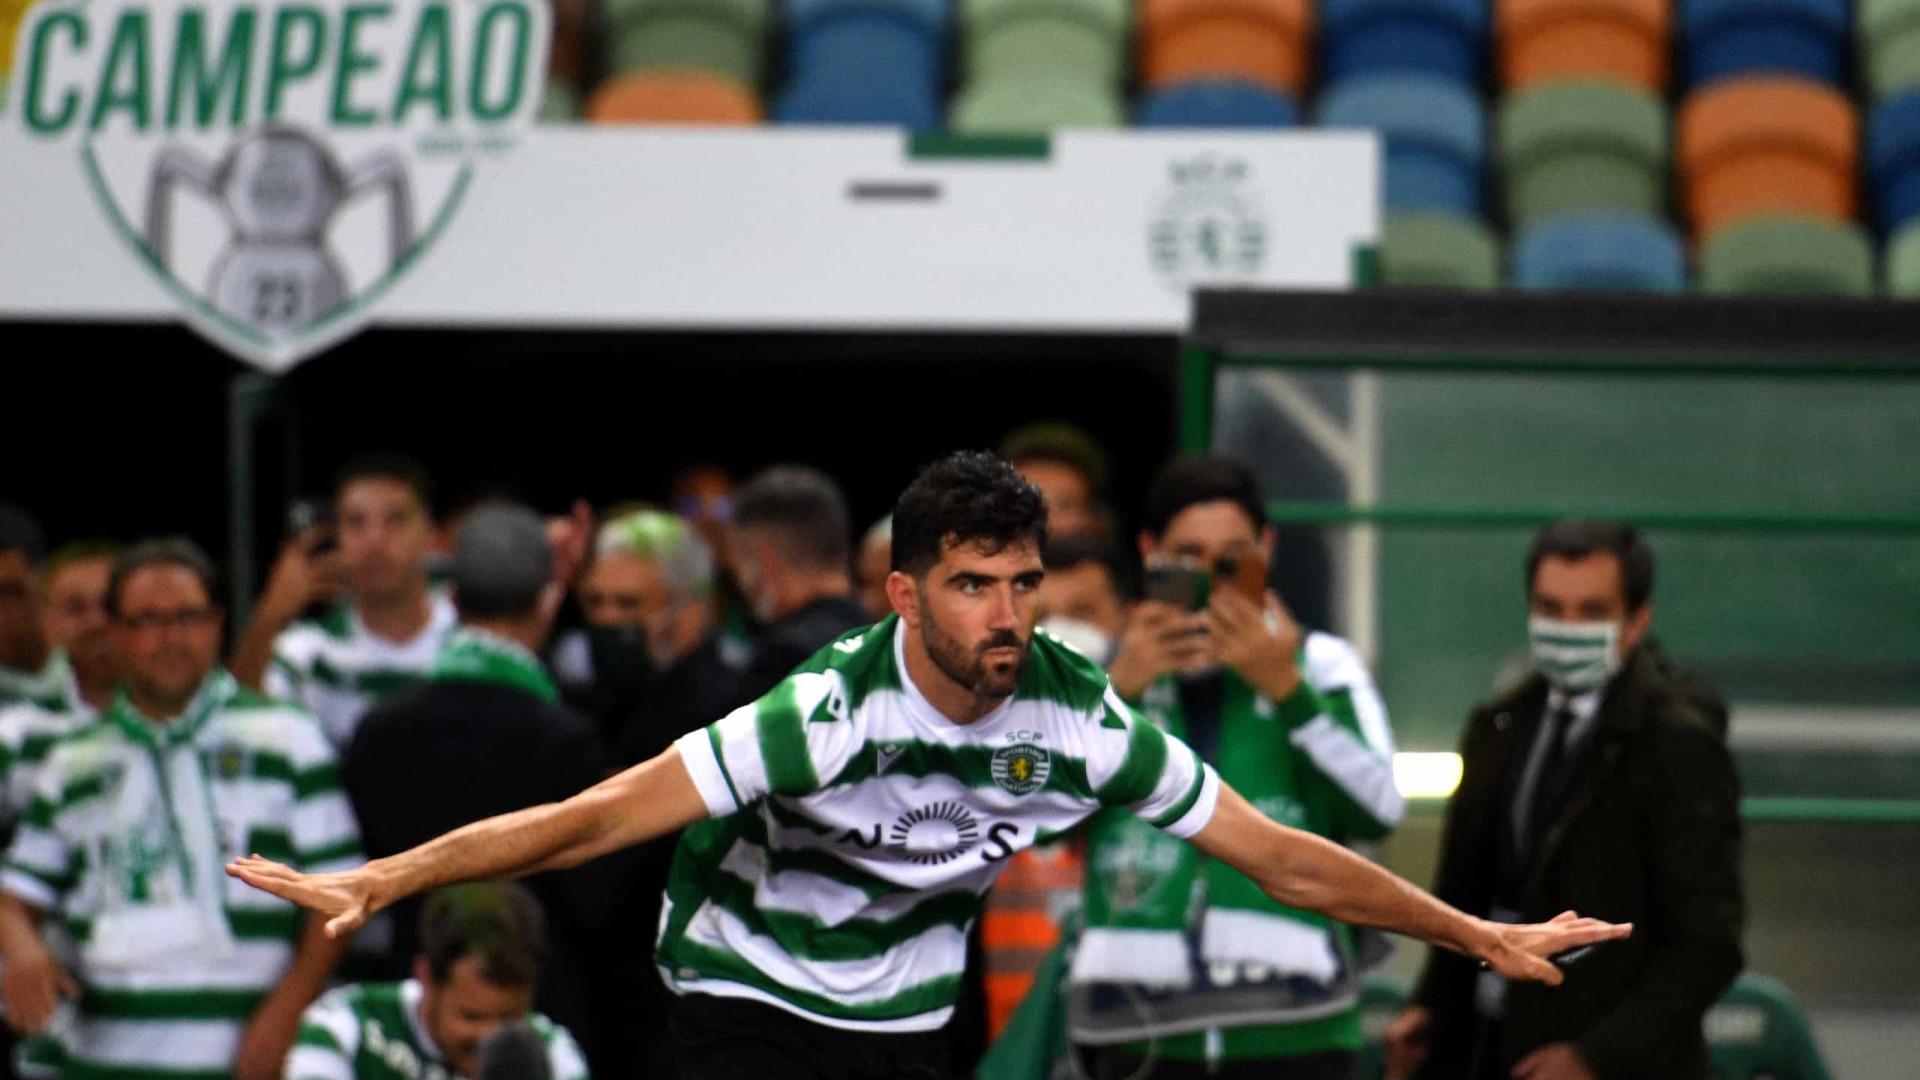 """Tive dúvidas se ia conseguir ver ou sentir a grandeza do Sporting"""